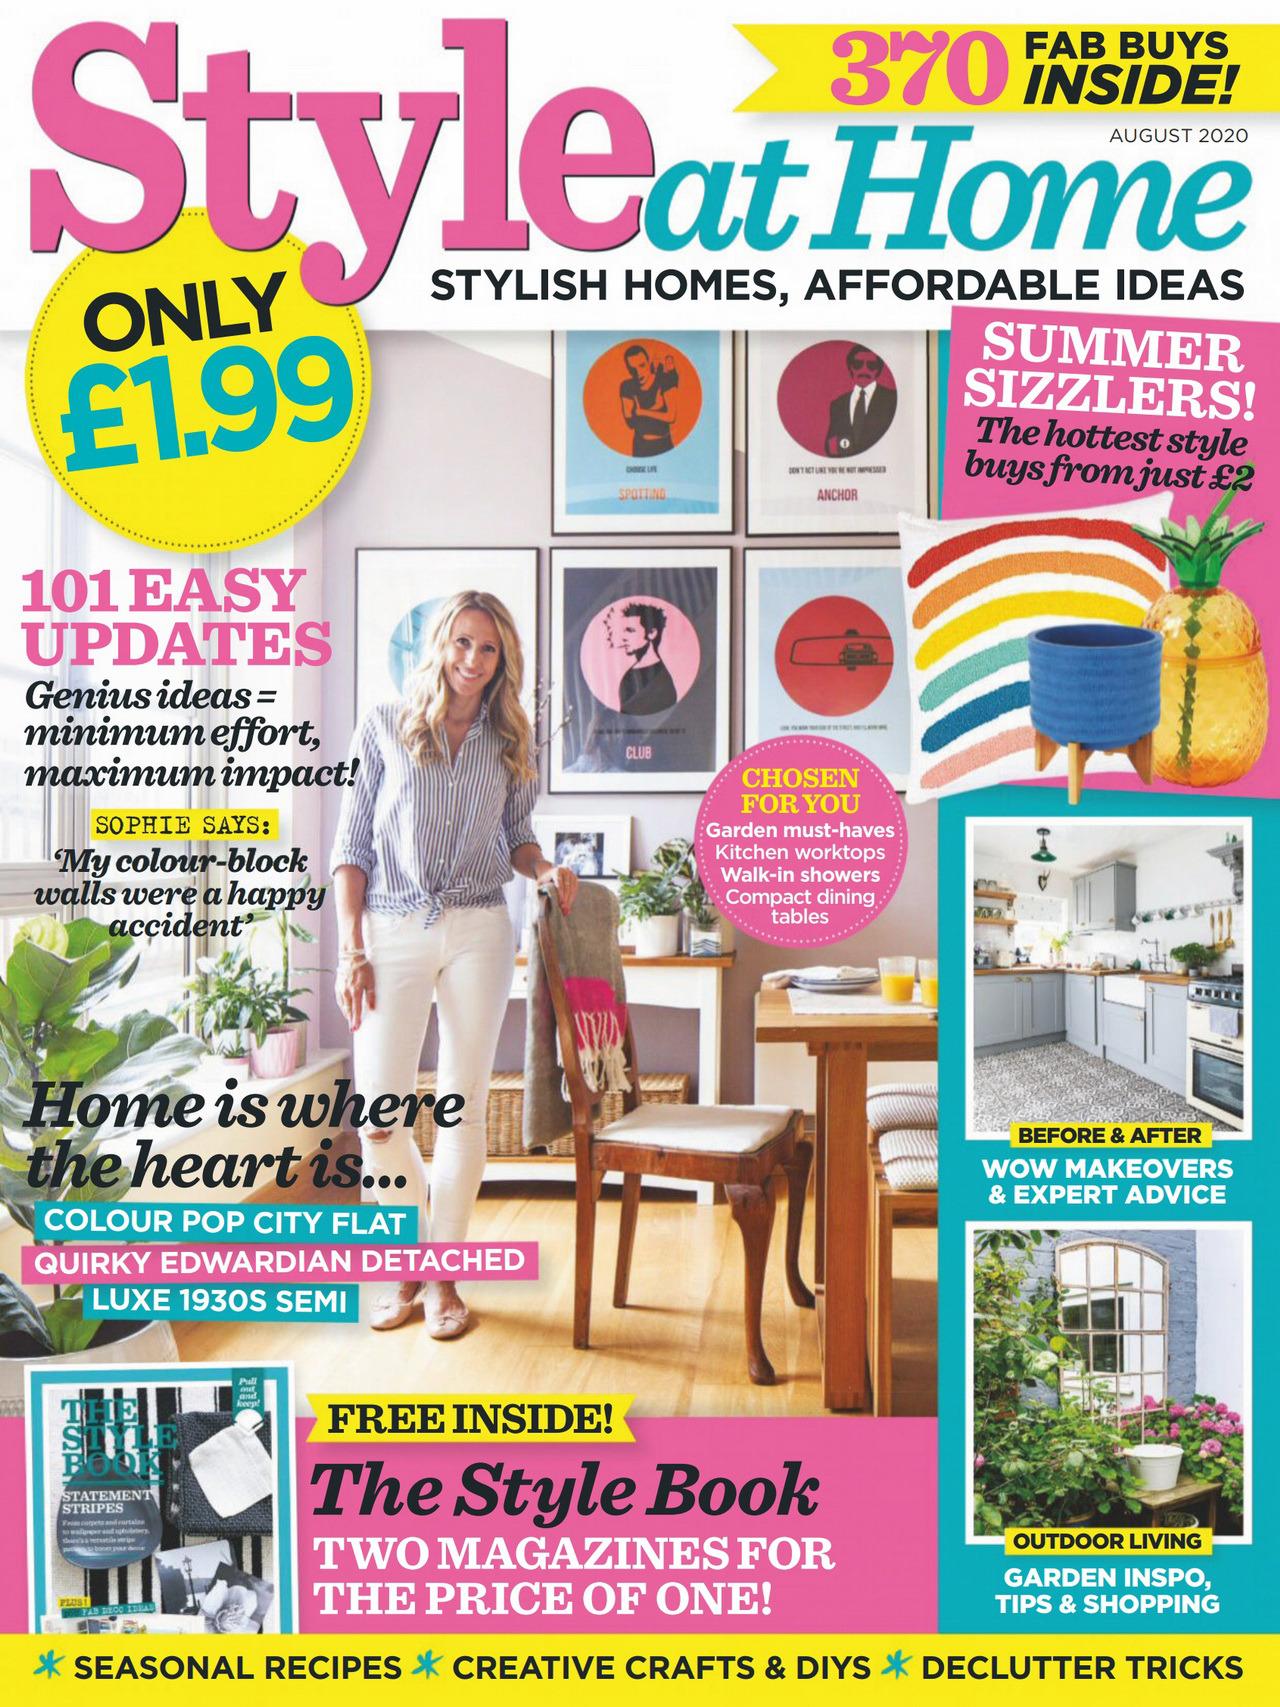 《Style at Home》英国版时尚家居杂志2020年08月号